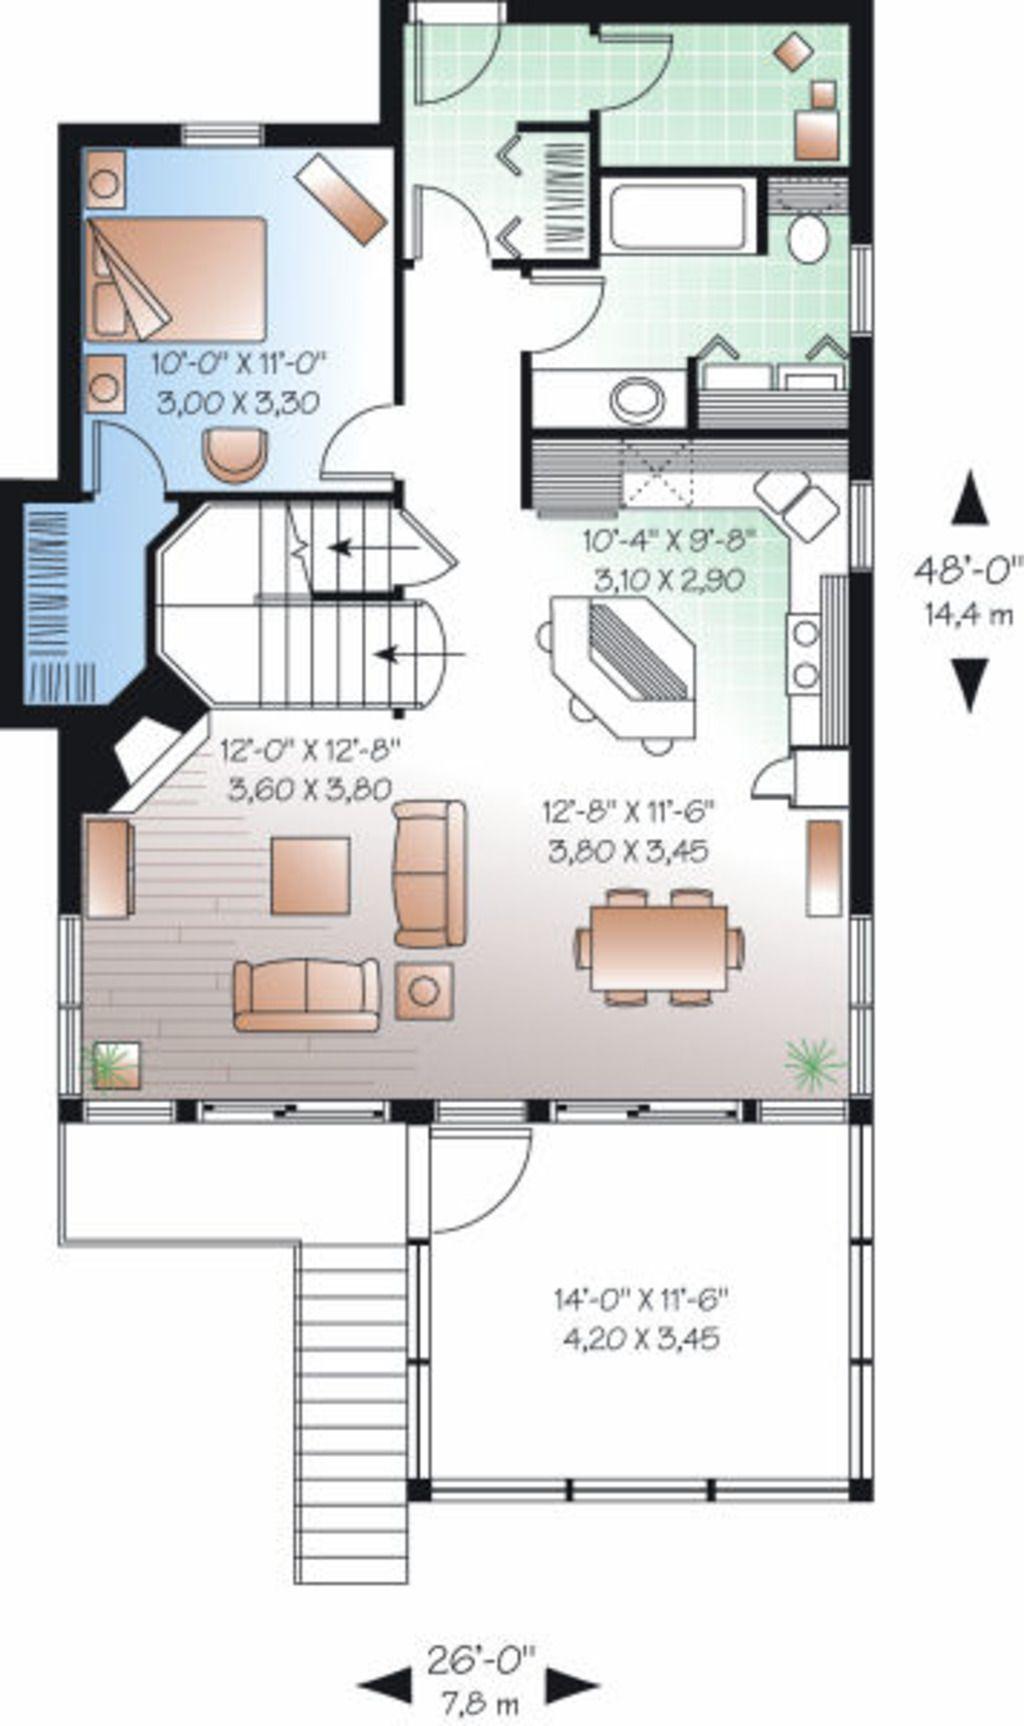 Beach Style House Plan 3 Beds 2 Baths 1484 Sq Ft Plan 23 866 Beach Style House Plans Lake House Plans Cottage House Plans